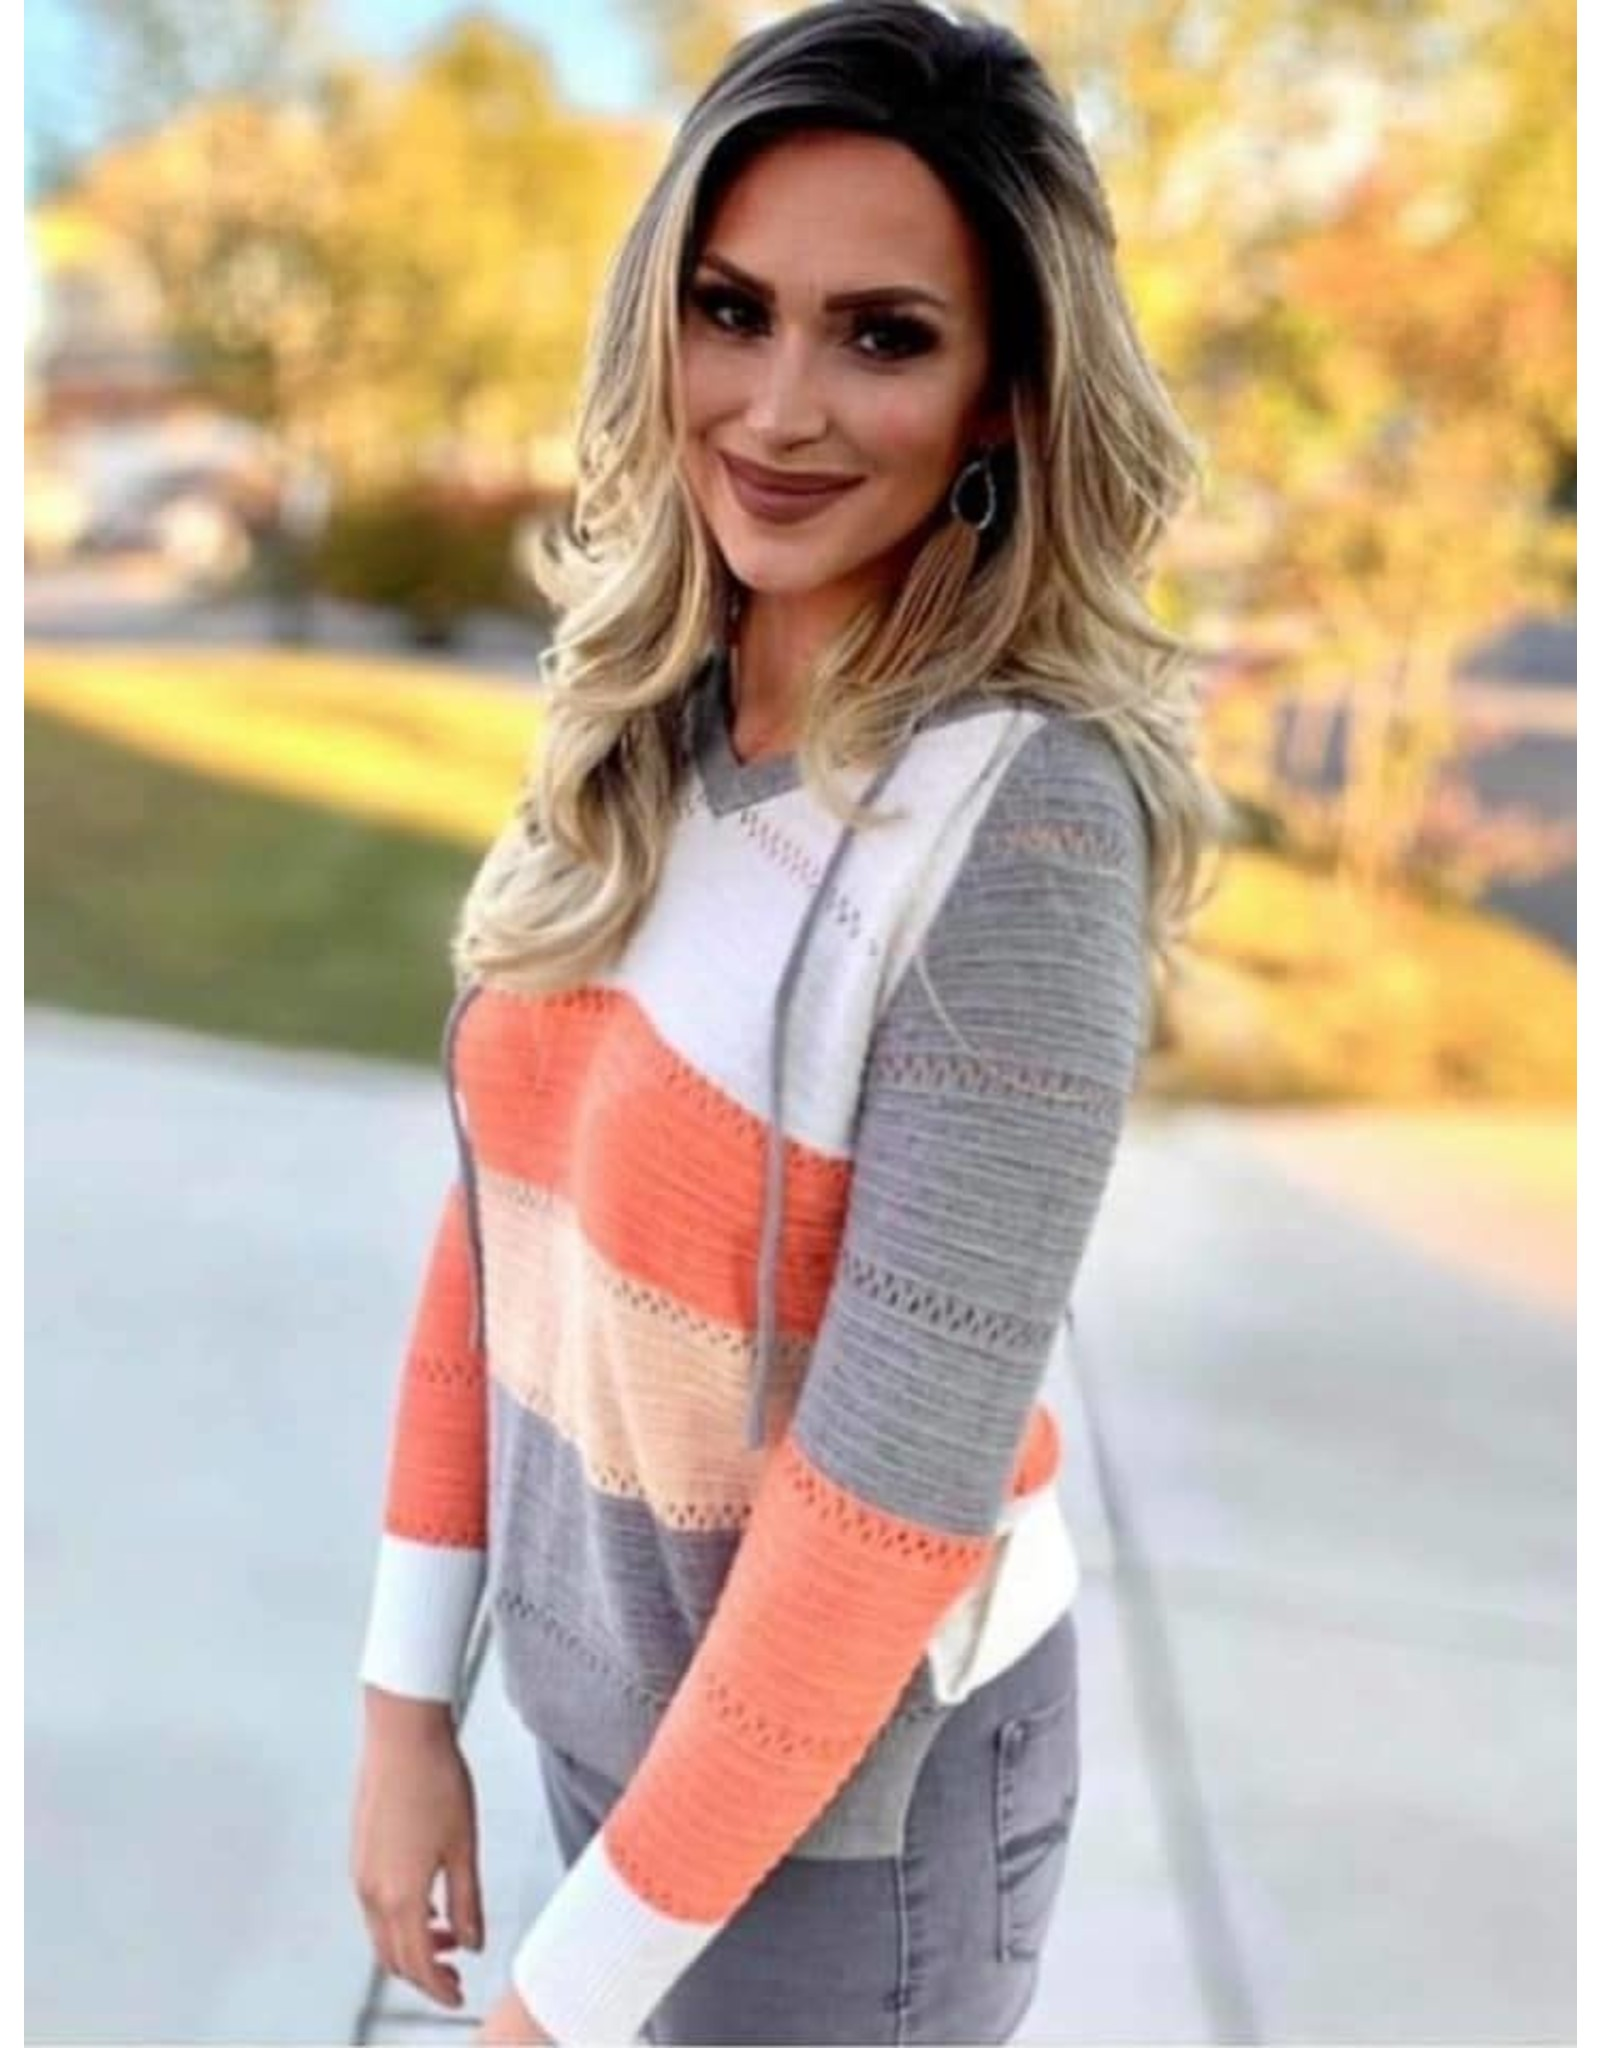 Kelly Hooded Sweater